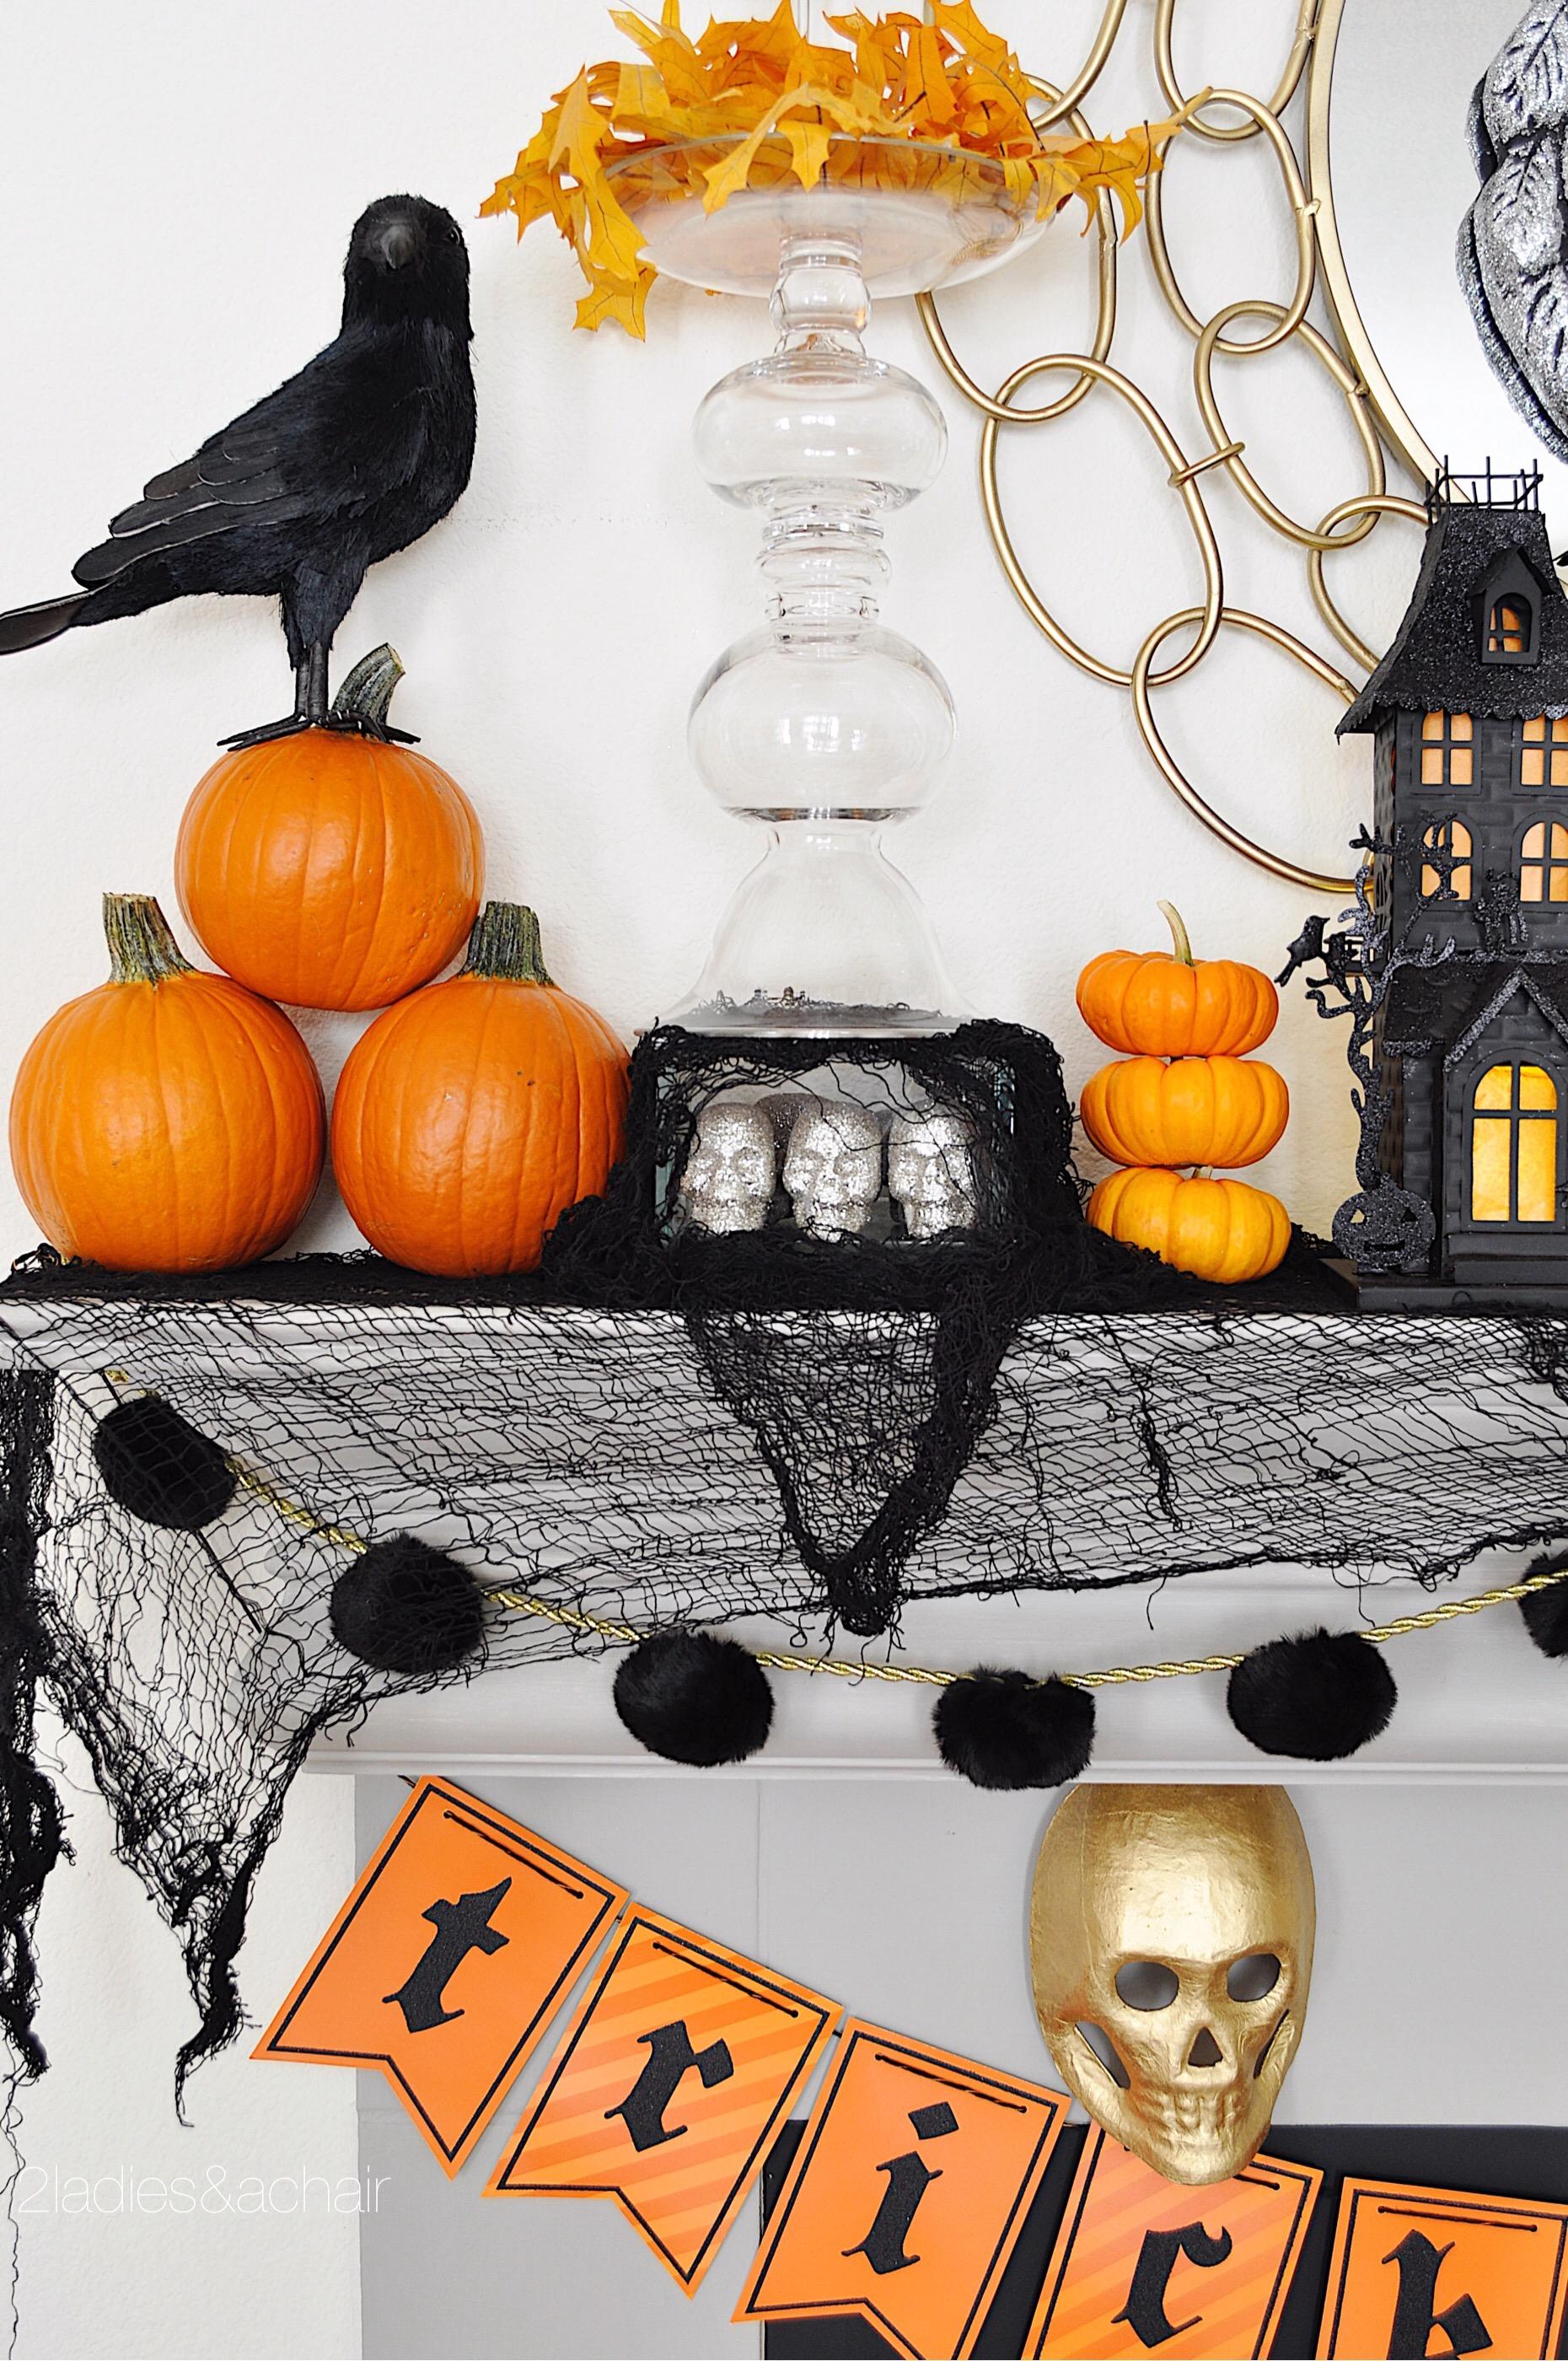 halloween mantel decorations FullSizeRender(90).jpg